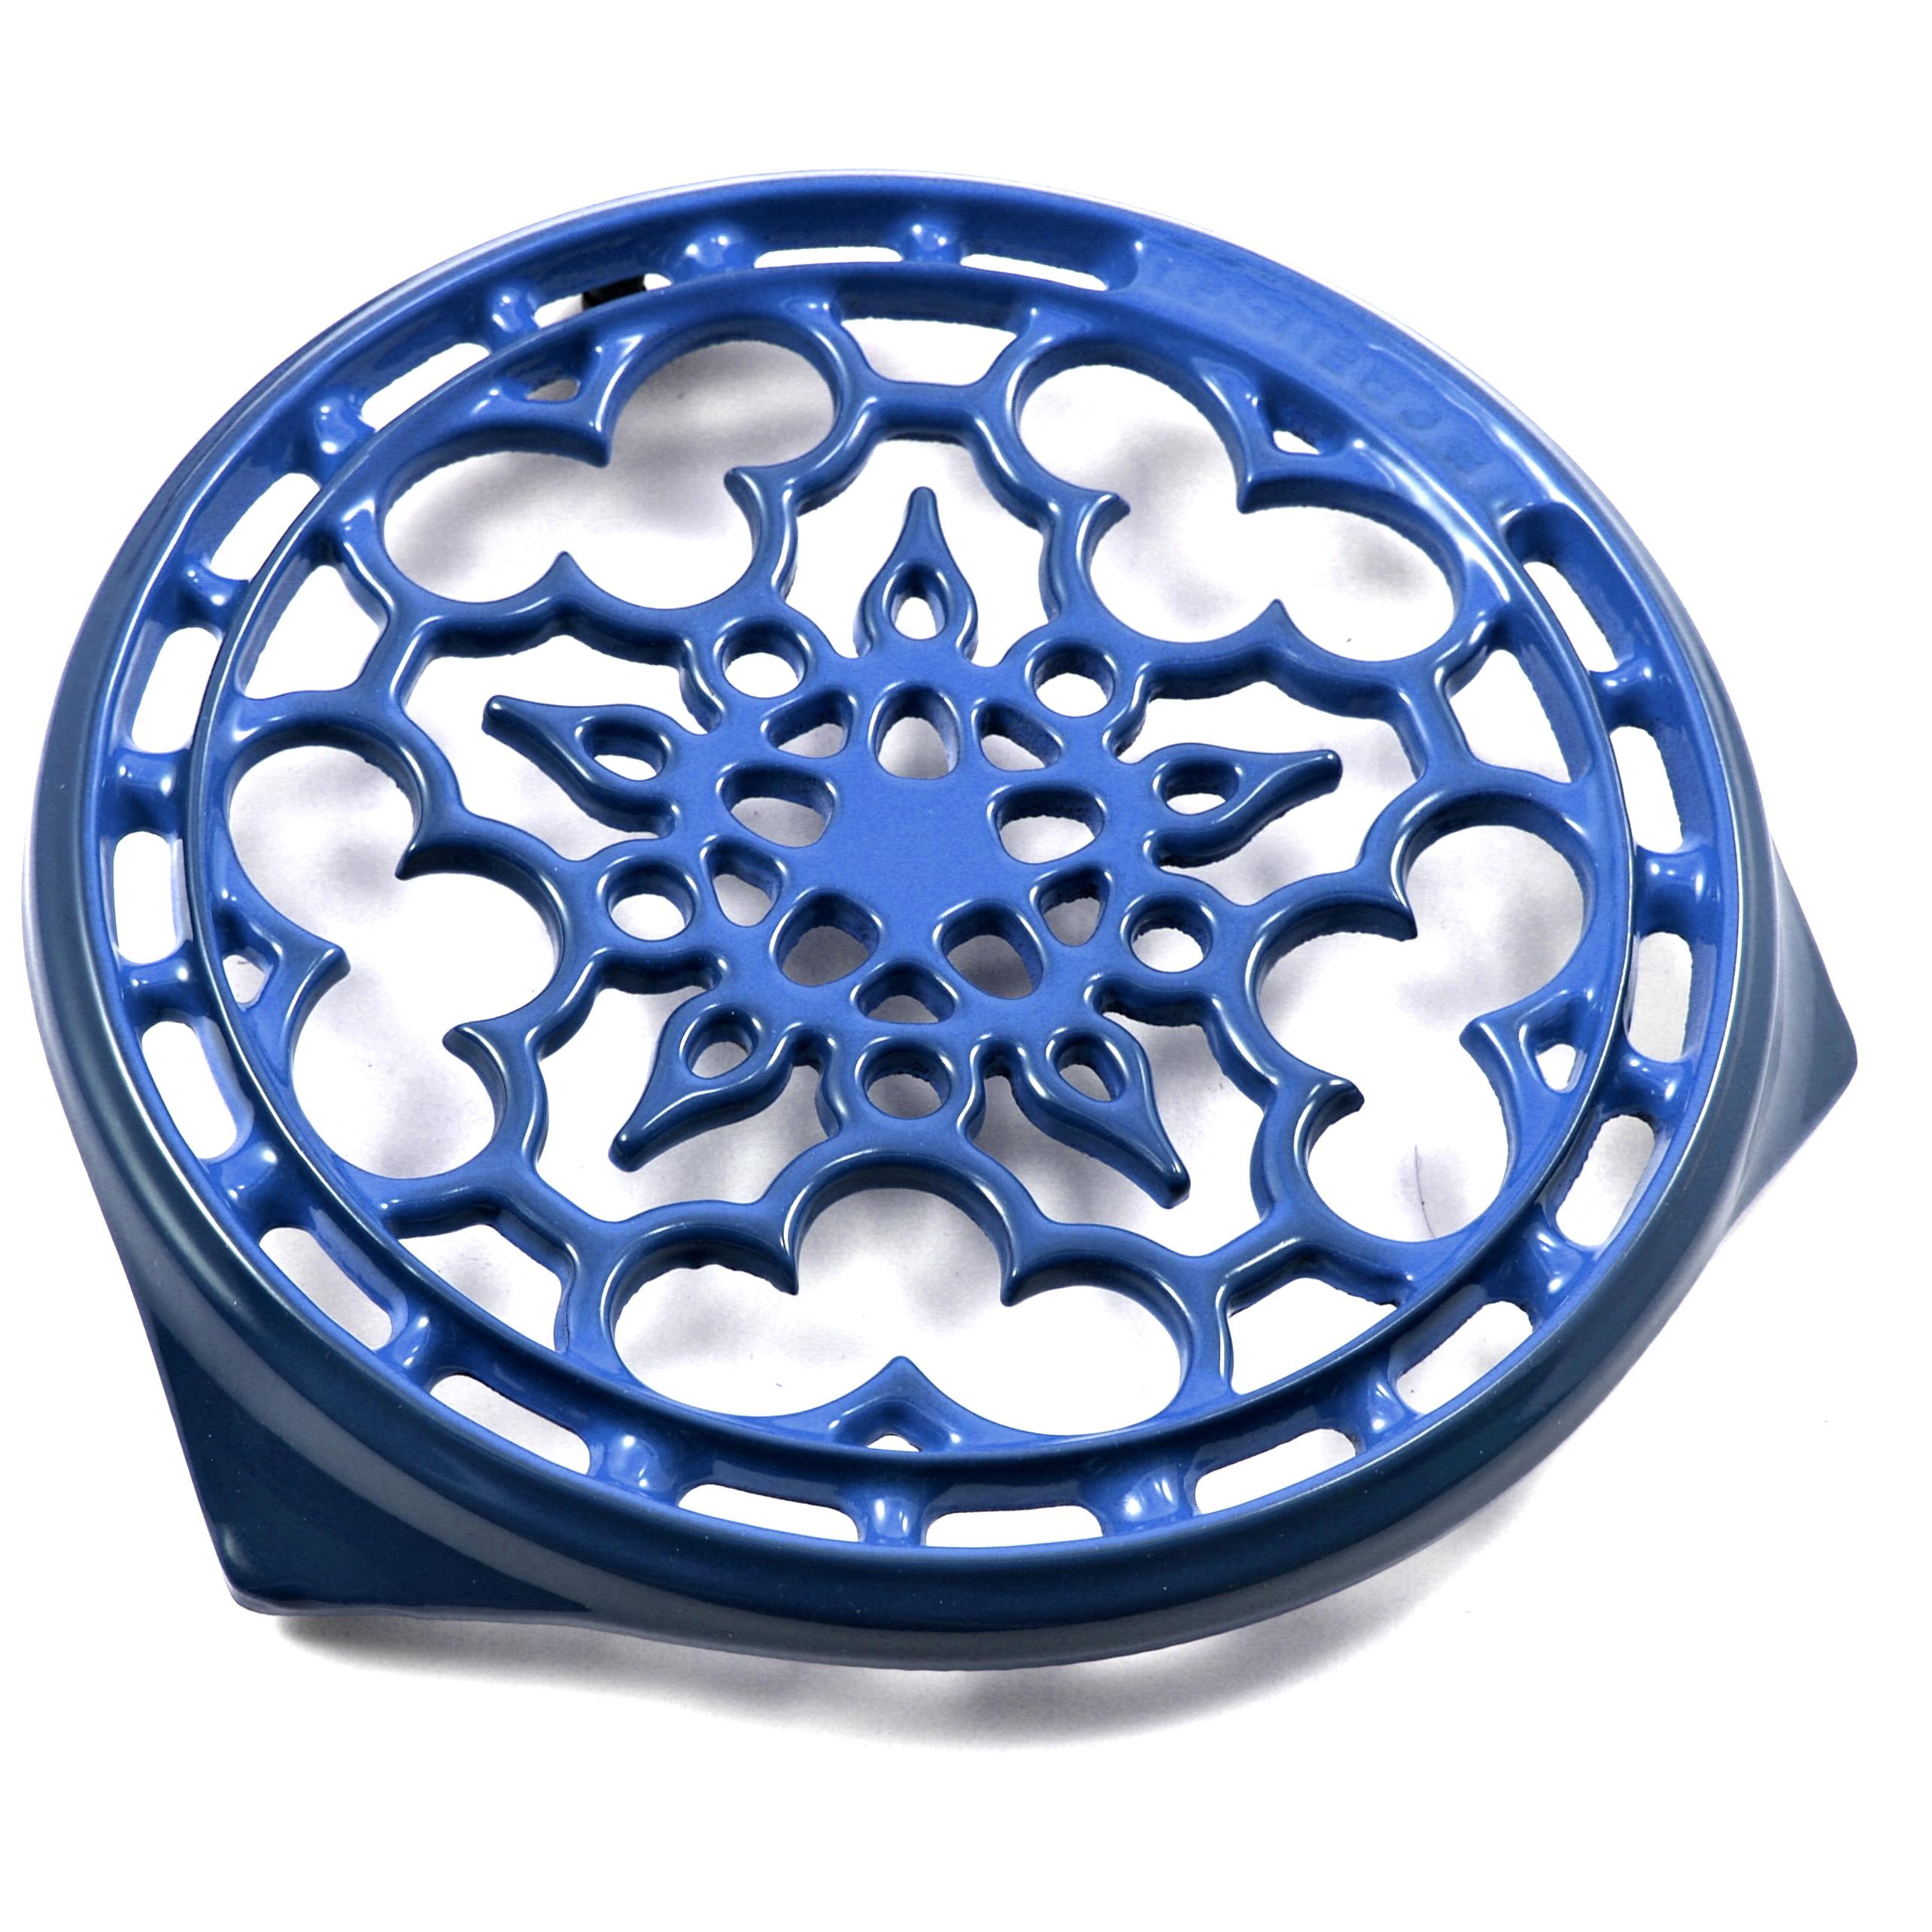 Le Creuset Marseille Blue Enameled Cast Iron Deluxe Round Trivet, 9 Inch